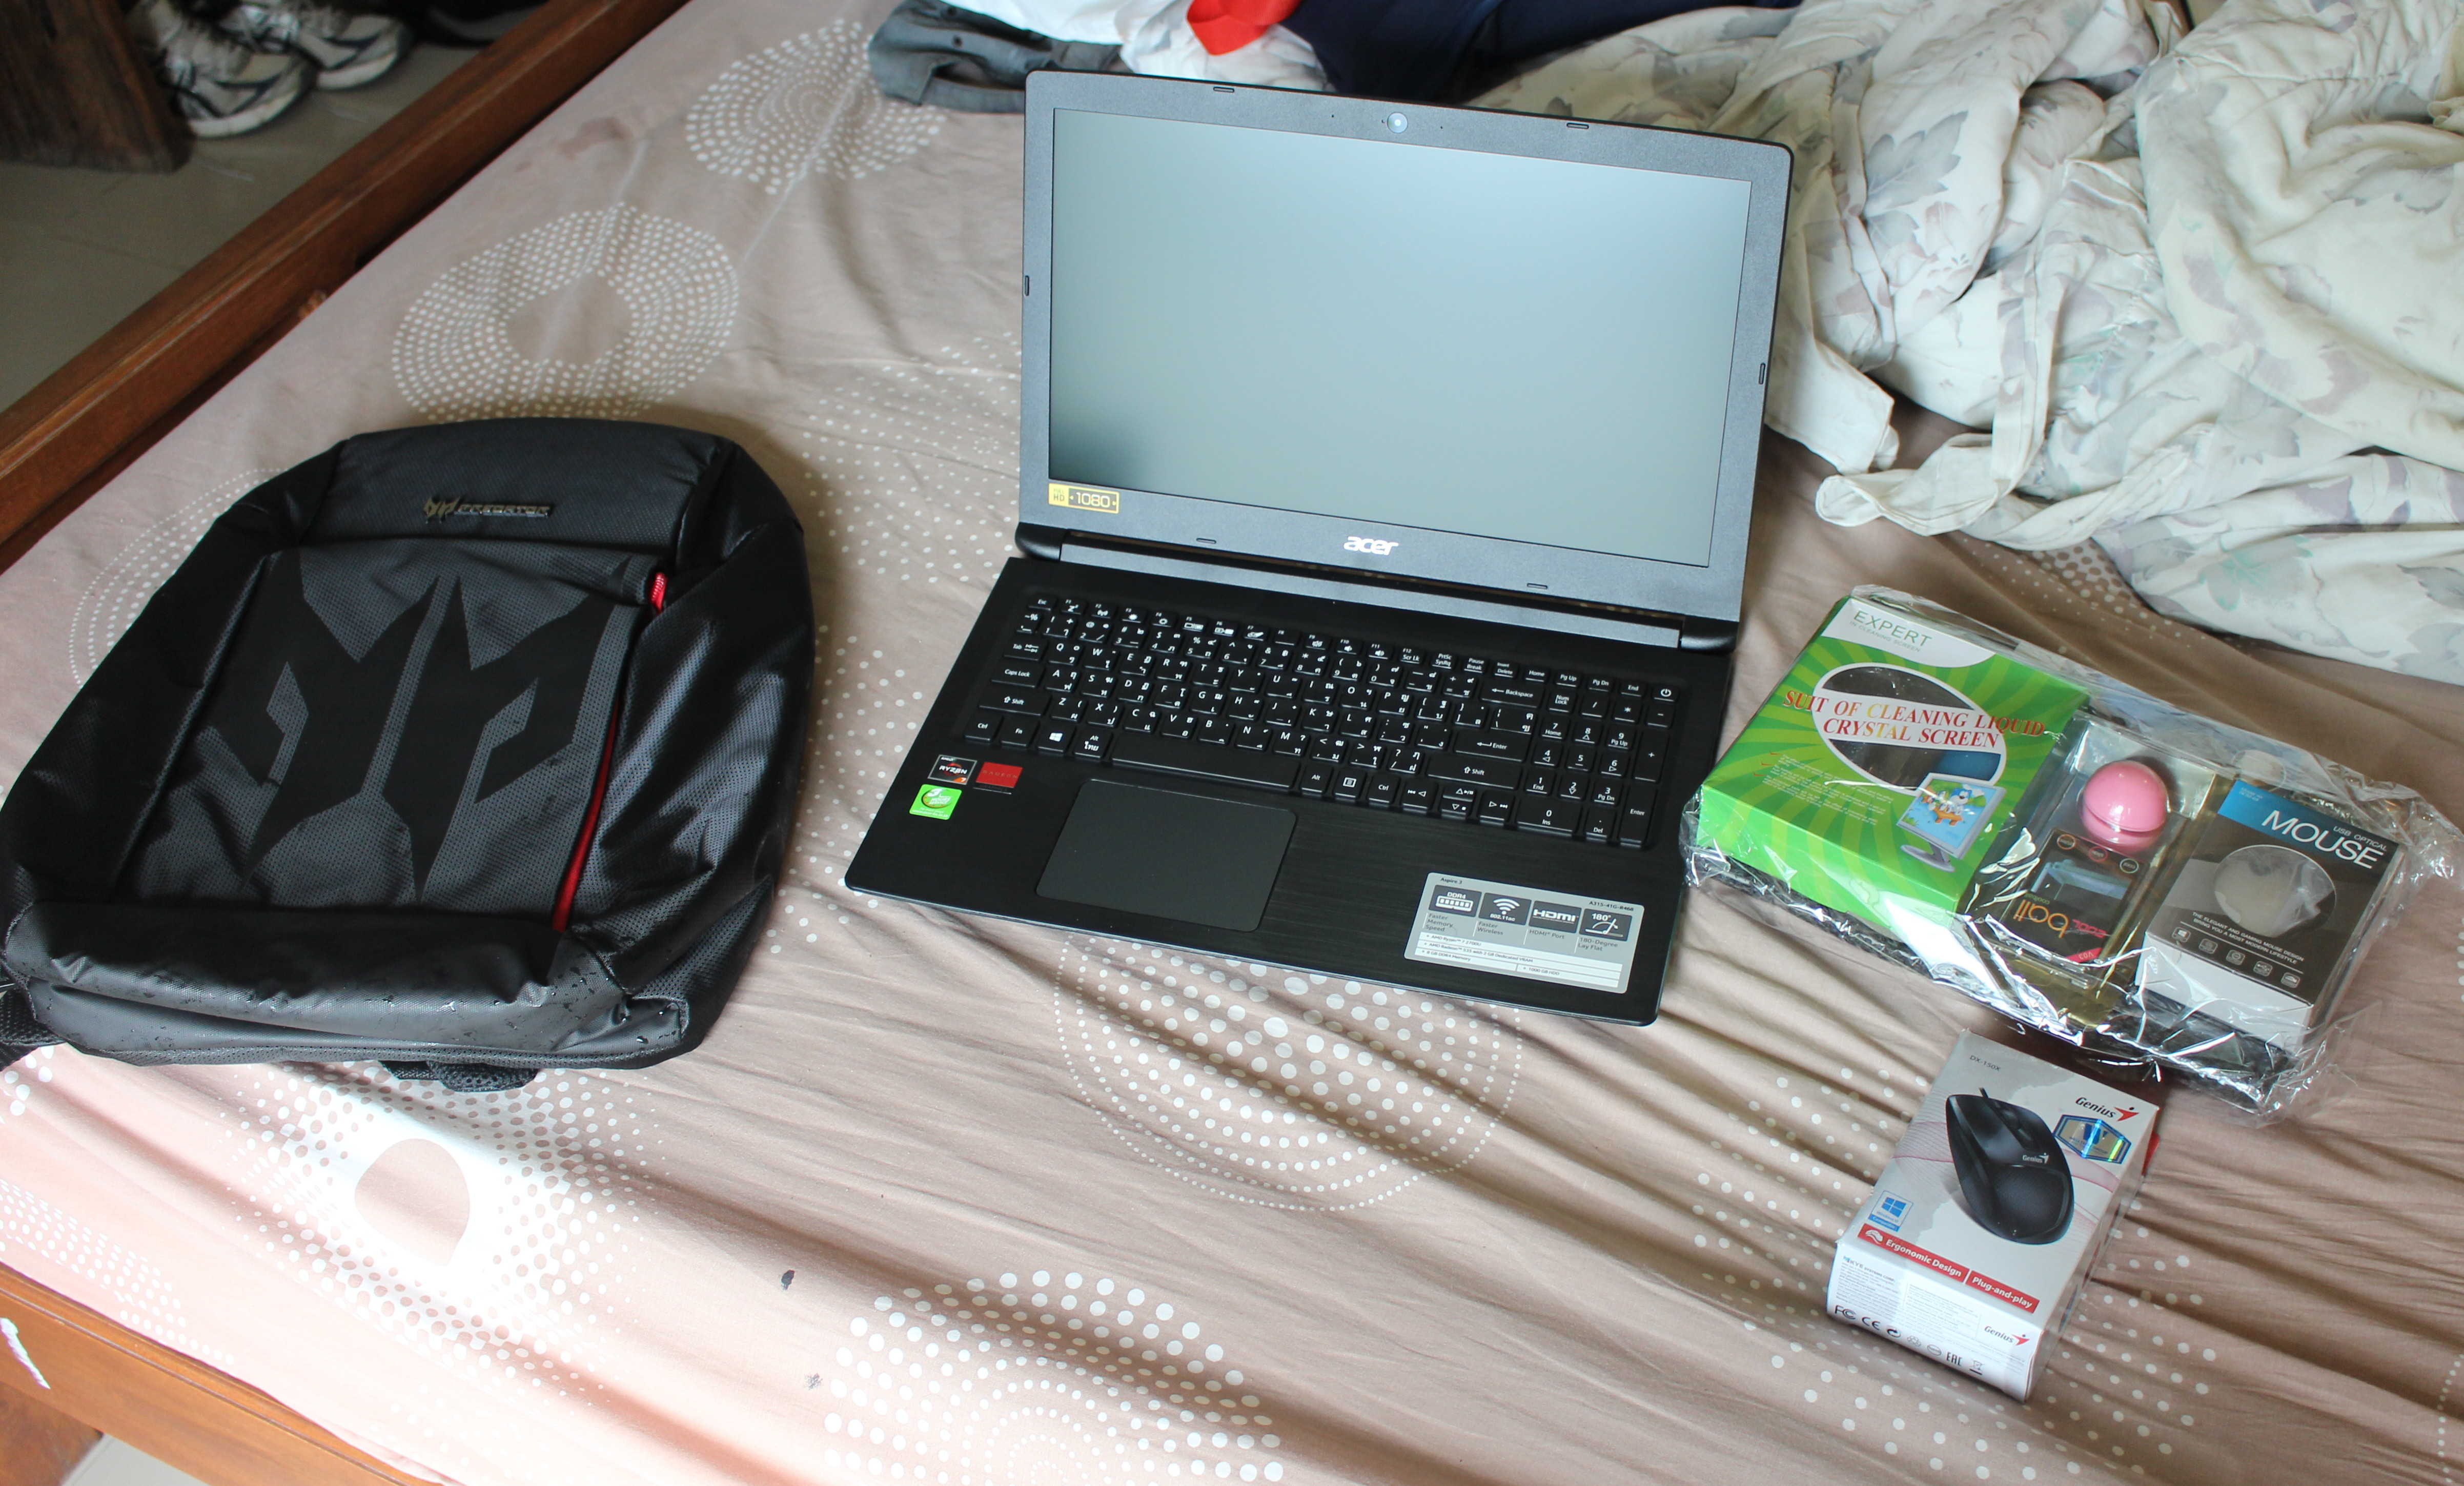 Acer Aspire 3 A315-41G (AMD Ryzen 7 2700U) Laptop - Installing